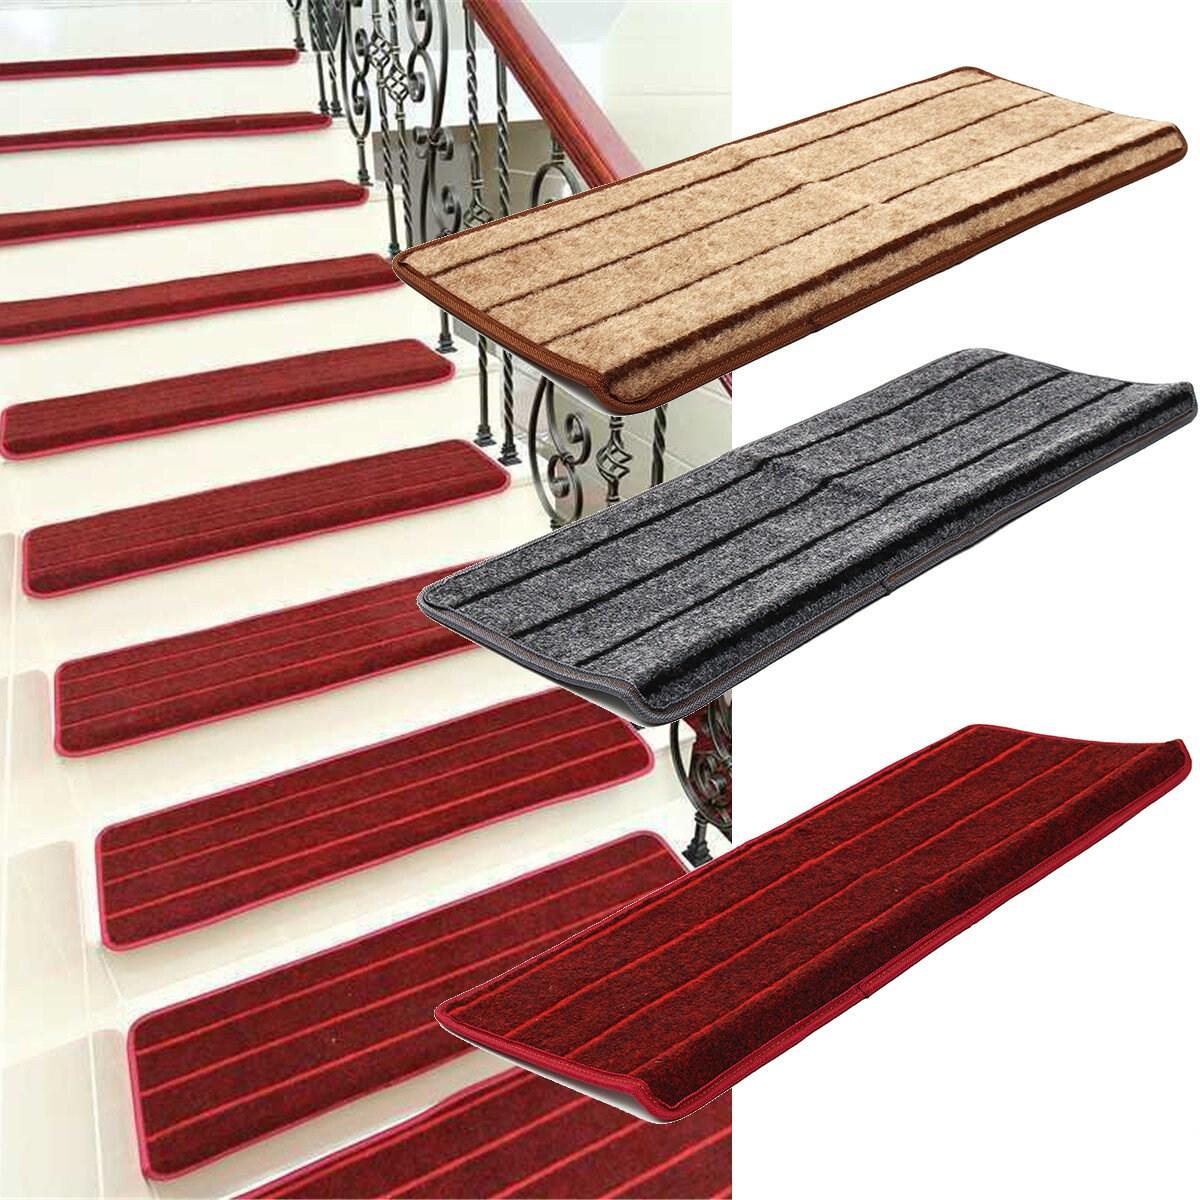 Non Slip Tread Carpet Mats Step Staircase Non Slip Mat Protection | Average Price To Carpet Stairs | Stair Case | Hardwood Stairs | Flooring | Hardwood Flooring | Measure